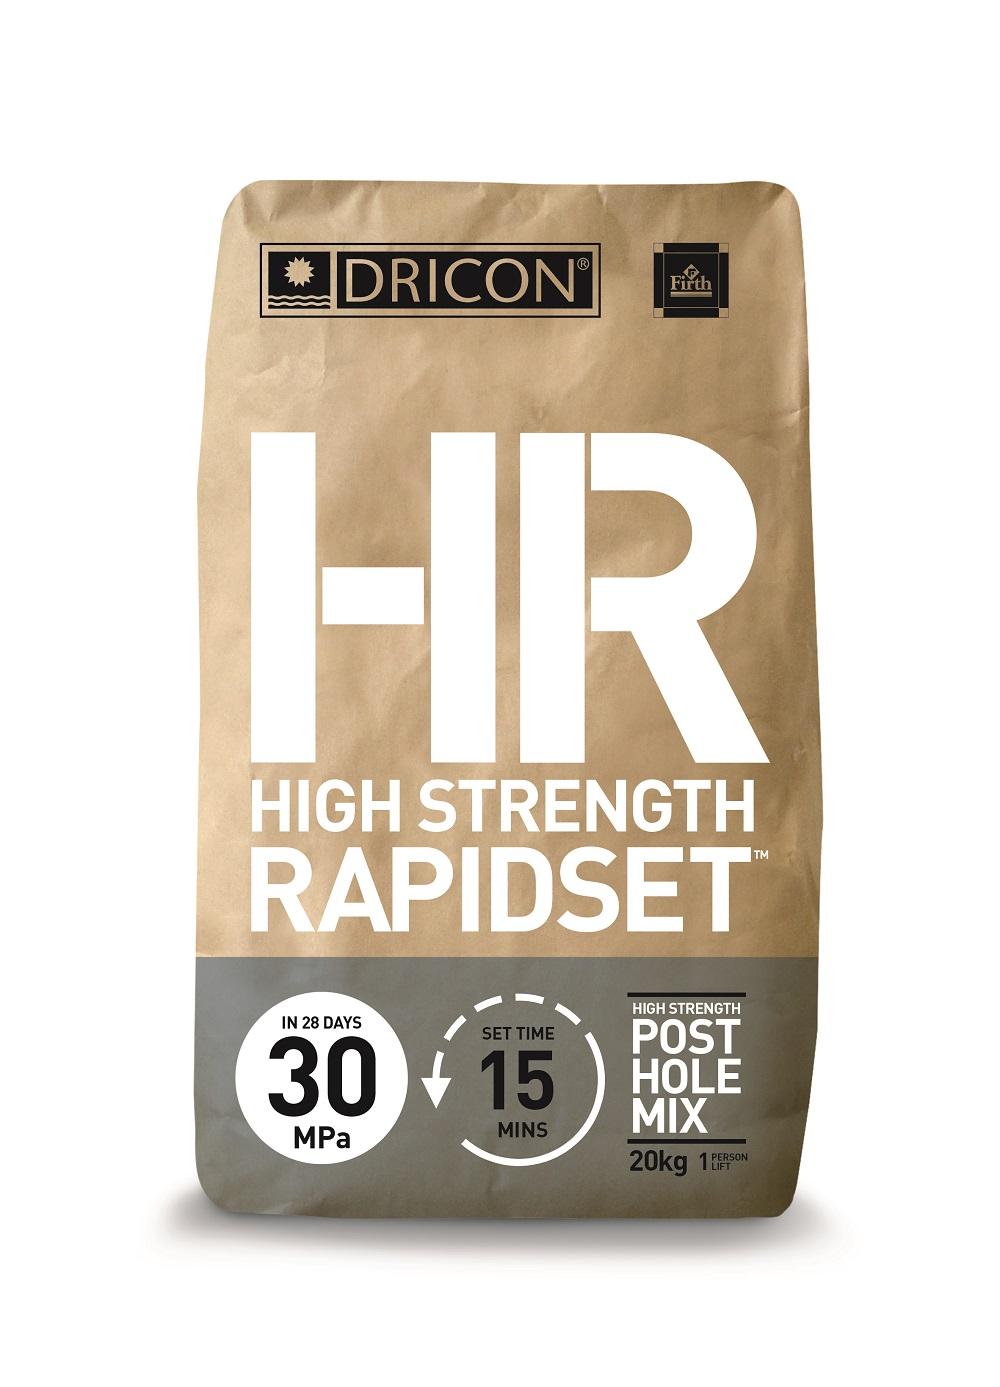 High Strength RapidSet